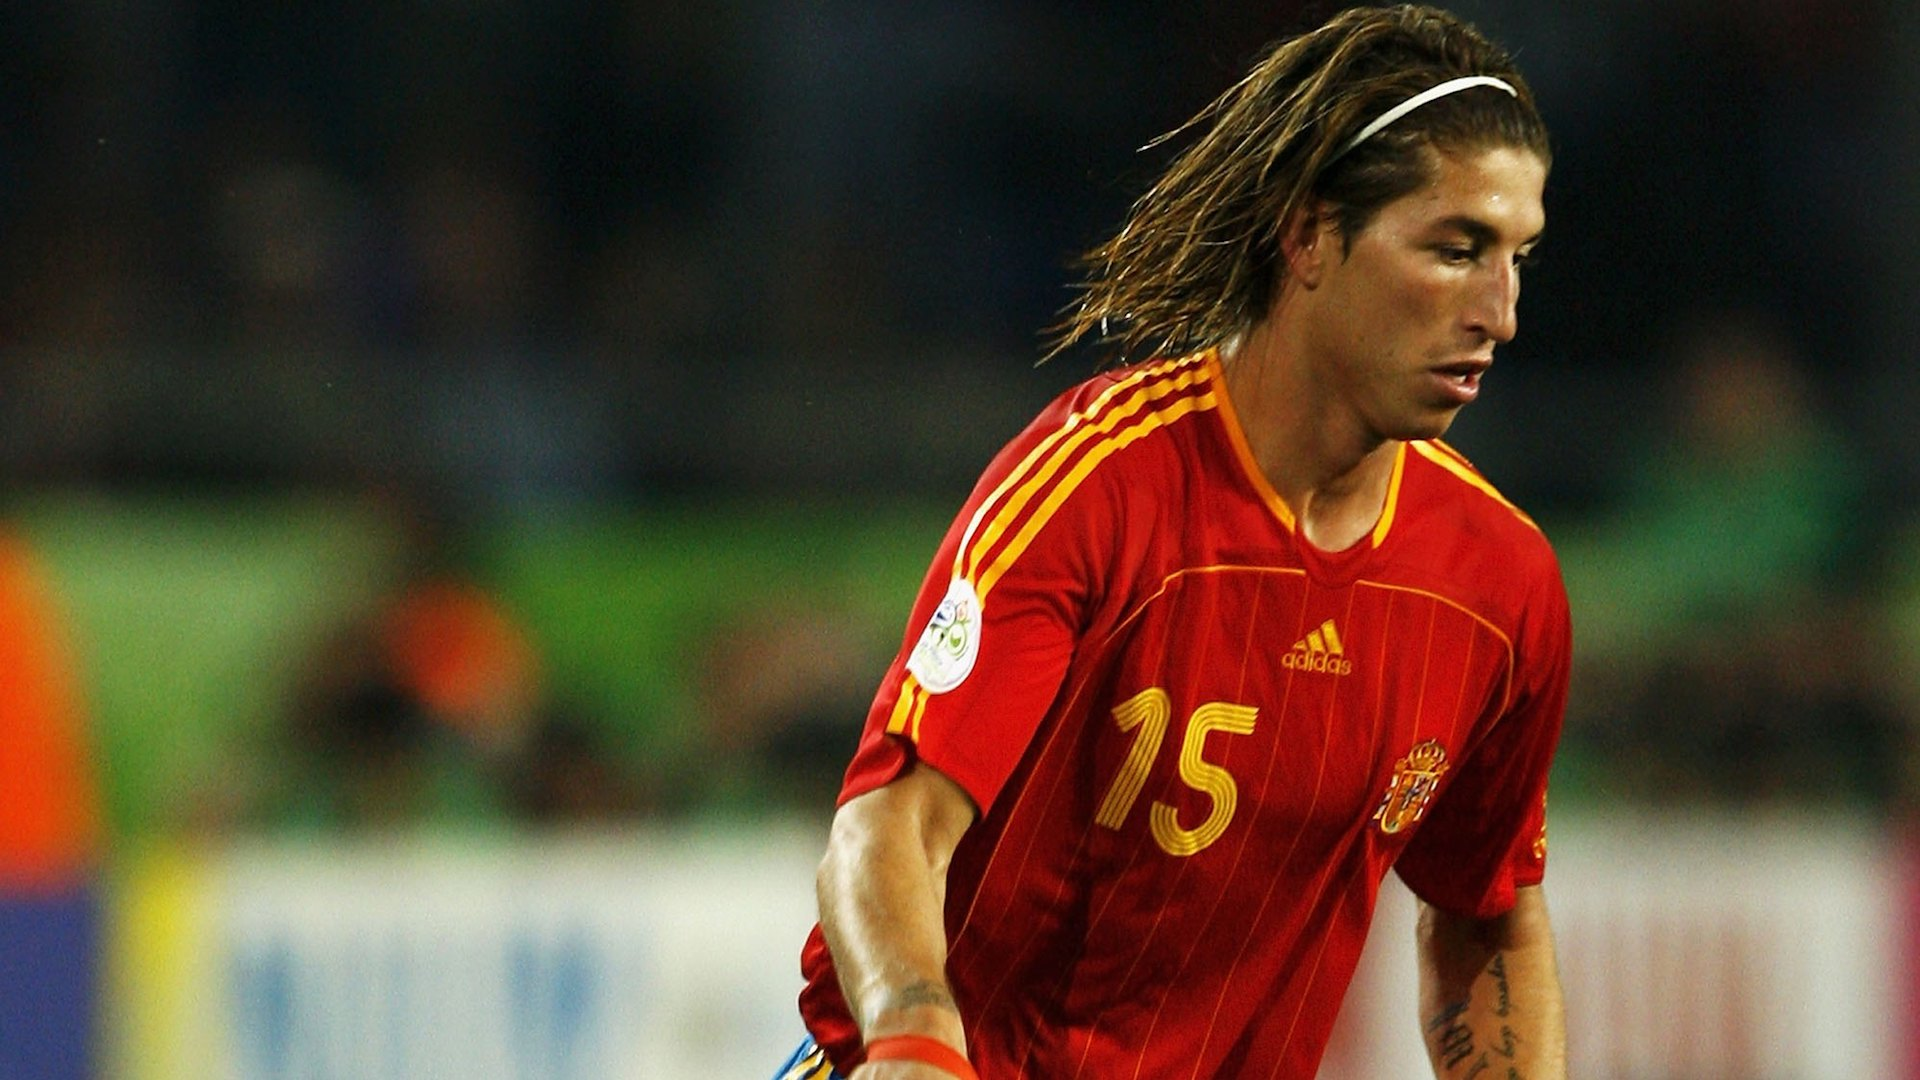 Image Result For Brasil Vs Senegal En Vivo Streaming As